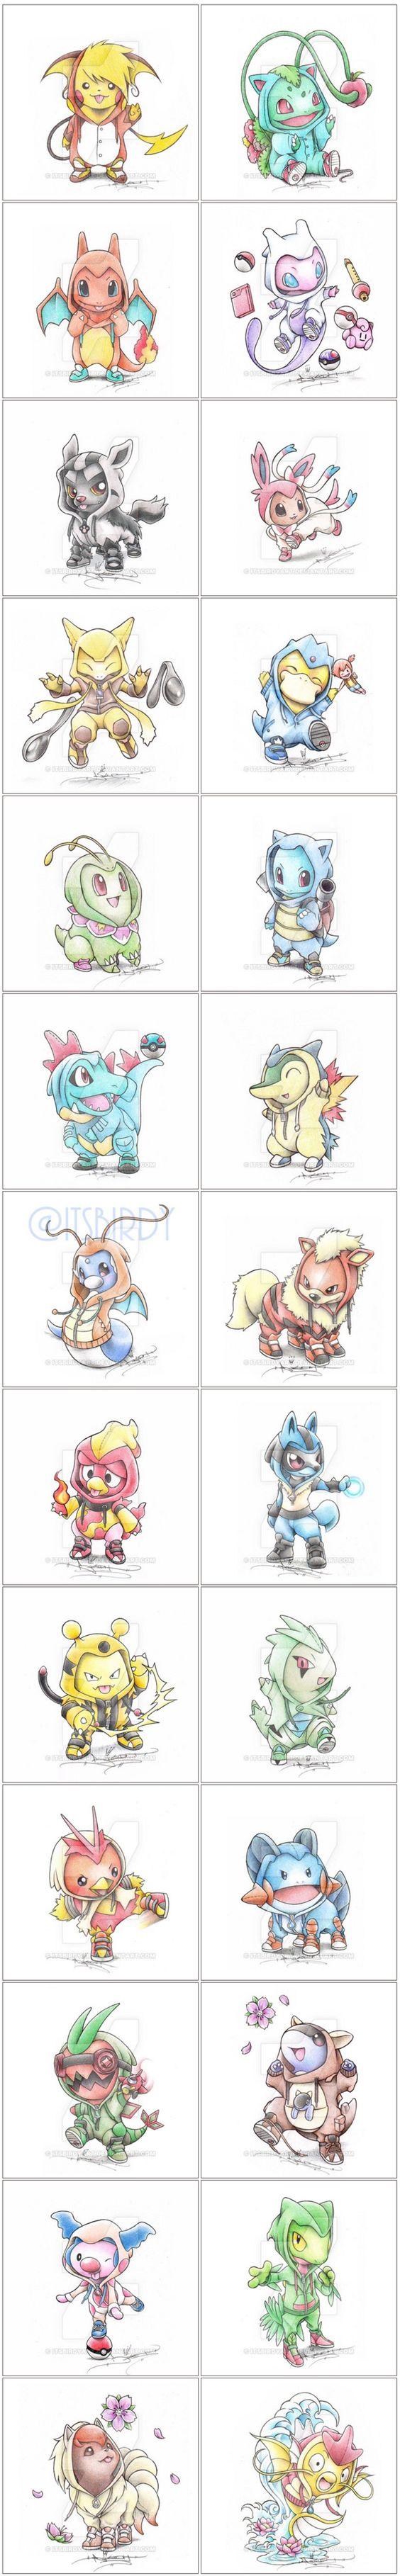 These Onesie-Wearing Pokémon Win All The Cuteness Points http://www.helpmedias.com/pokemongo.php